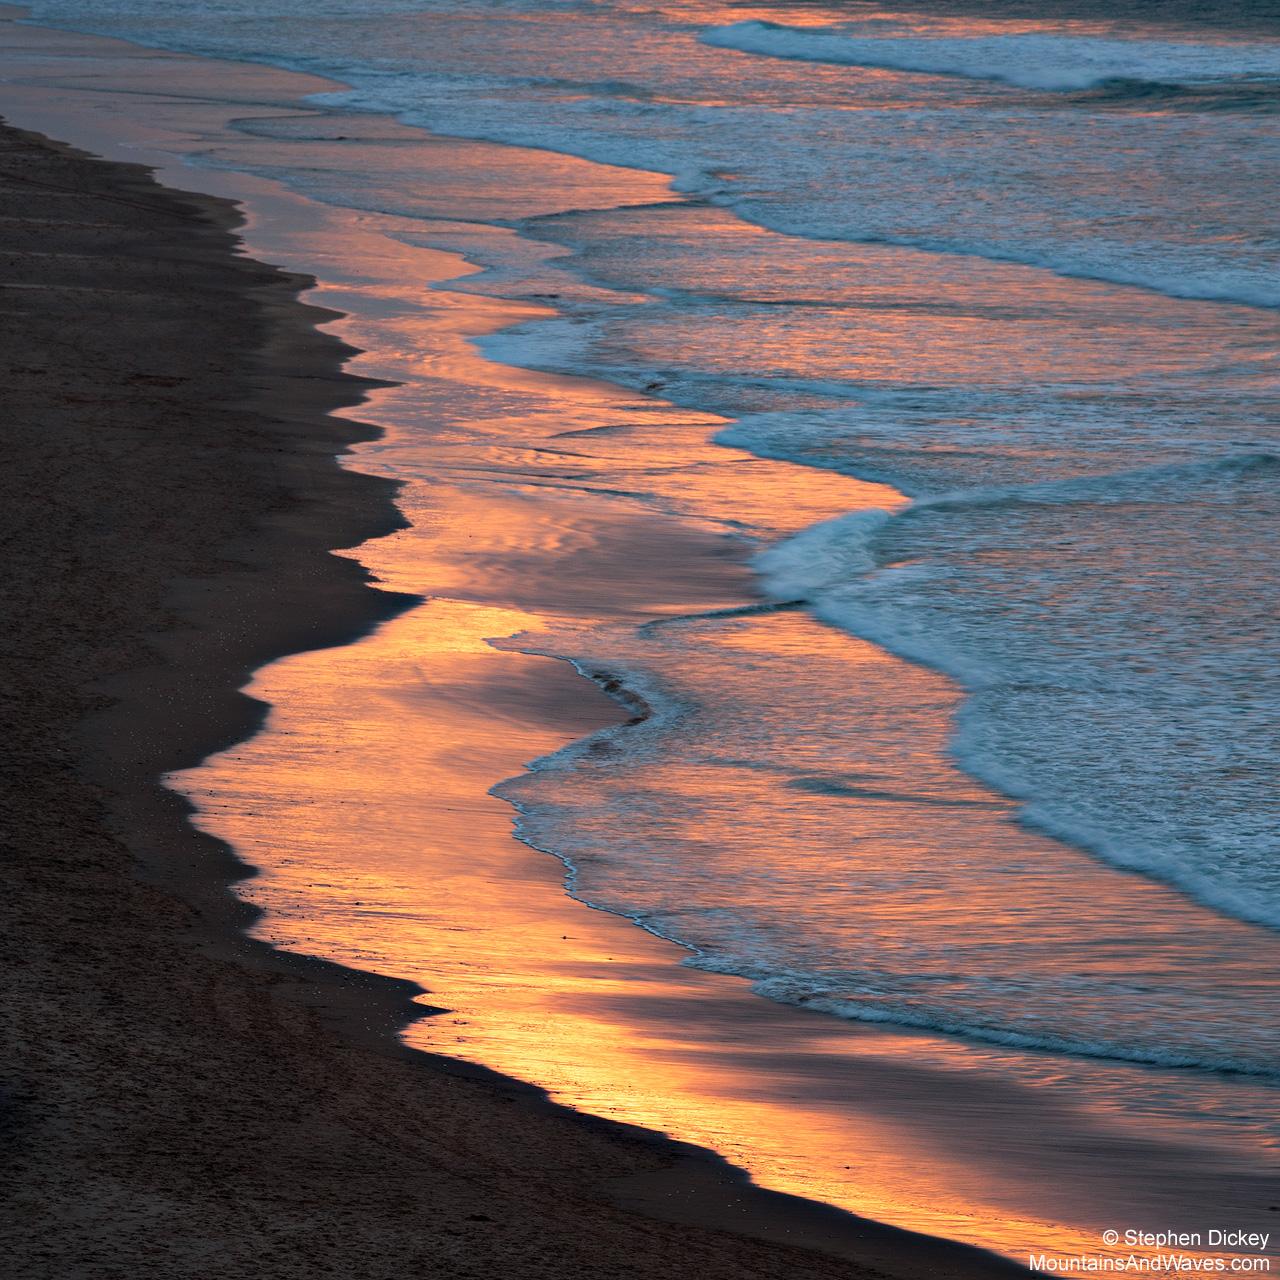 Whiterocks Beach Reflections, Portrush, Northern Ireland